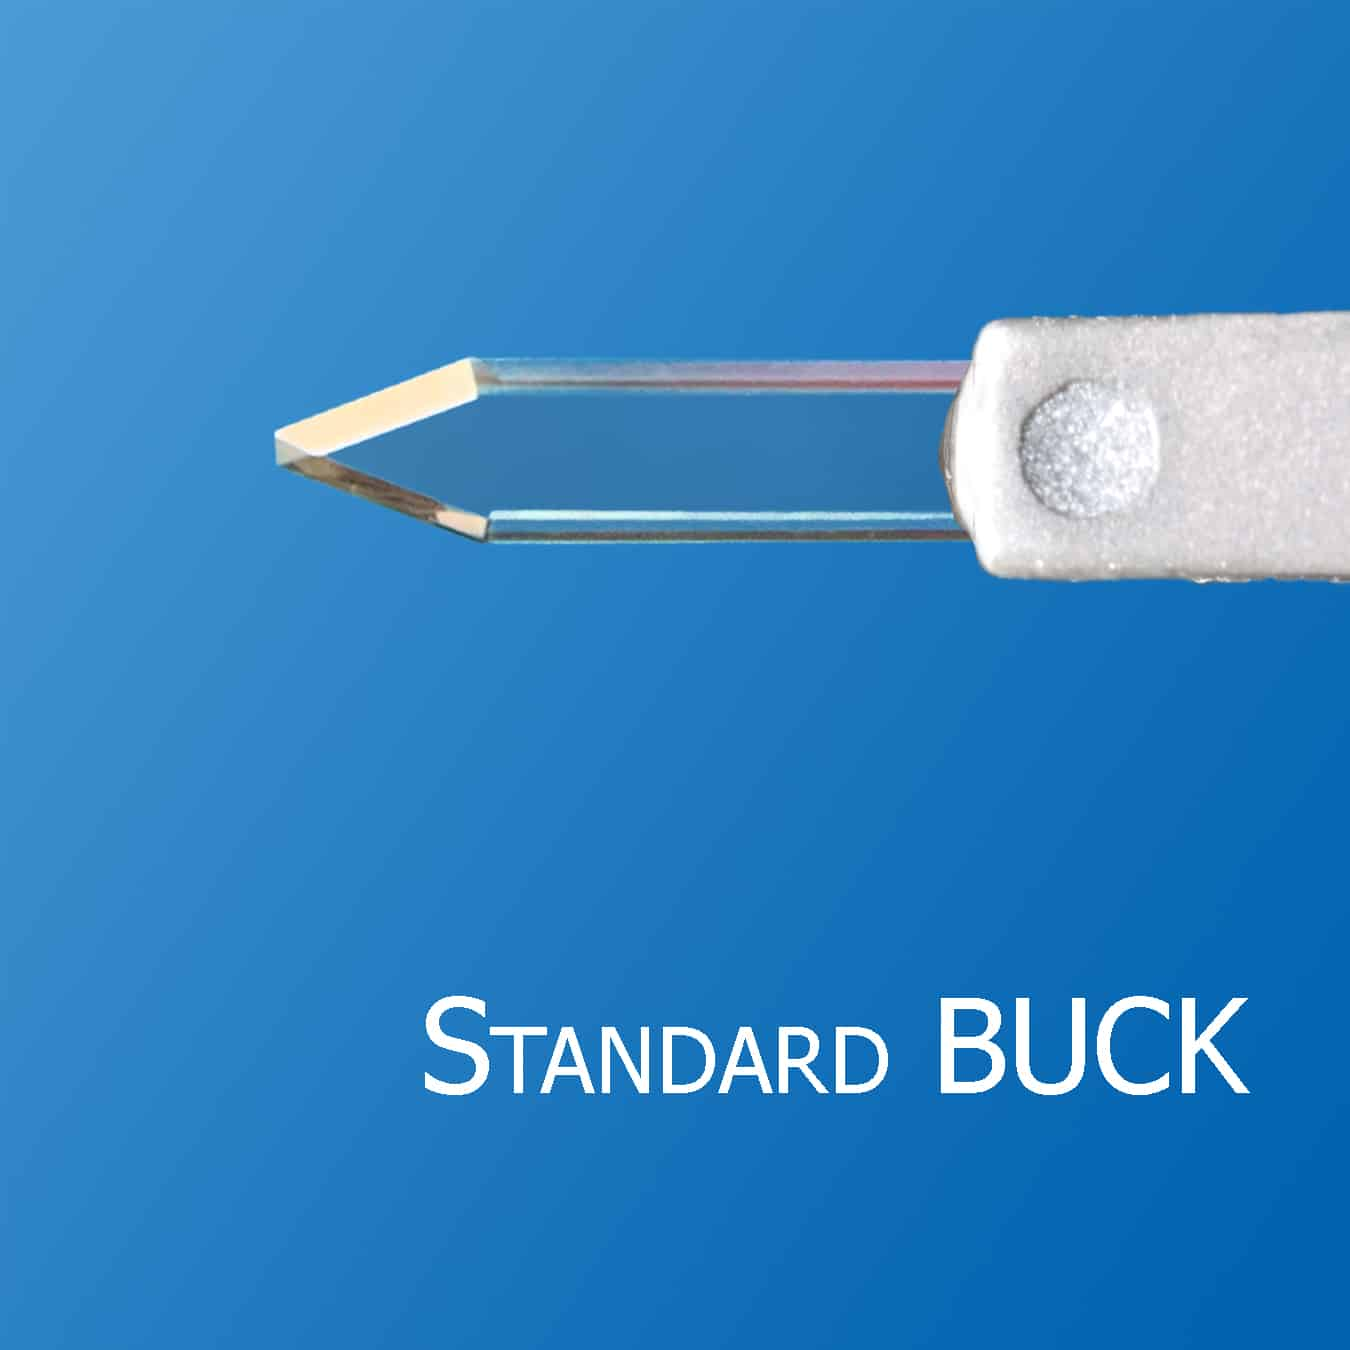 Standard BUCK